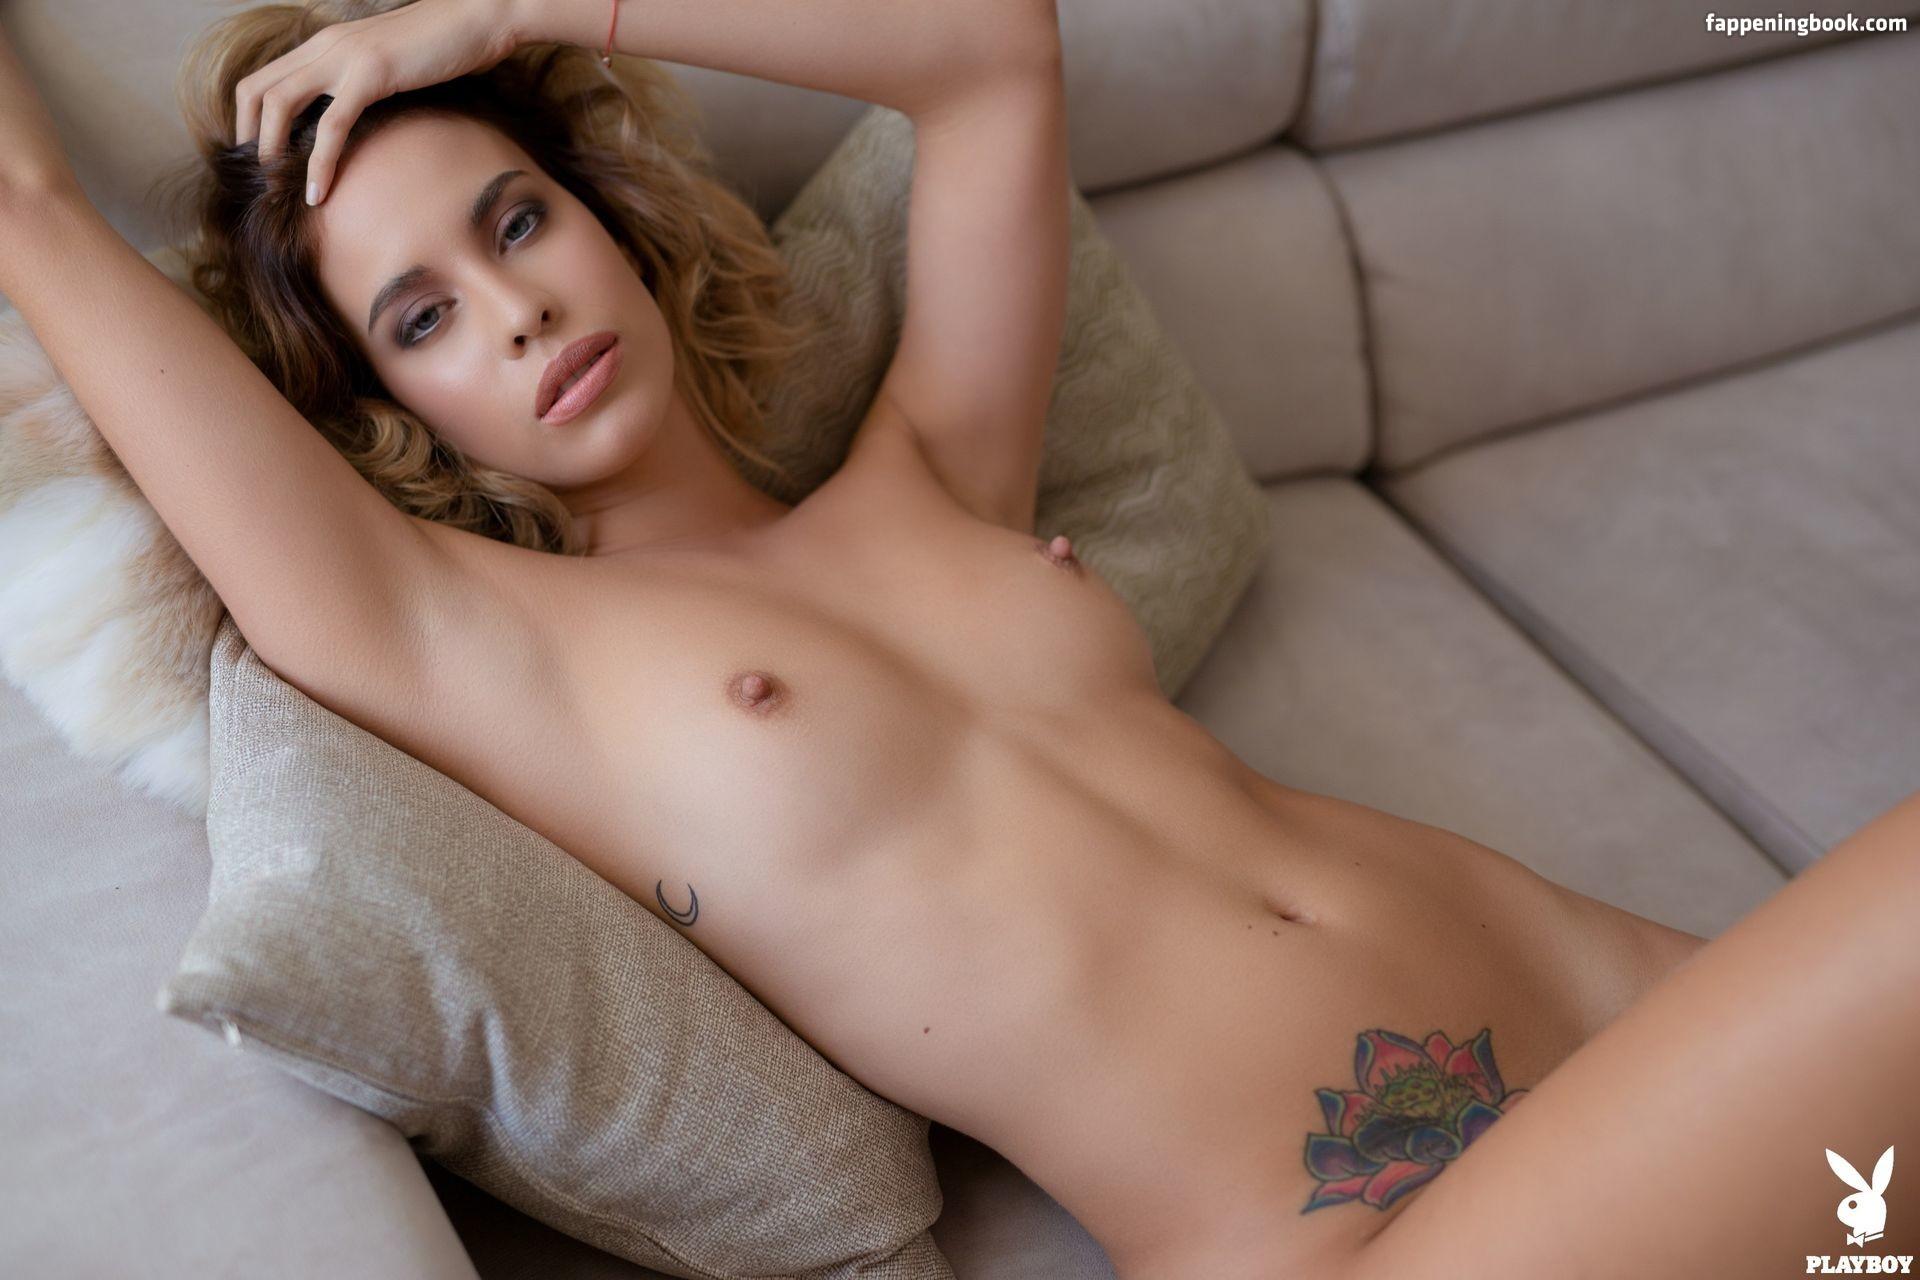 Allison Dean Nude toni maria nude, sexy, the fappening, uncensored - photo